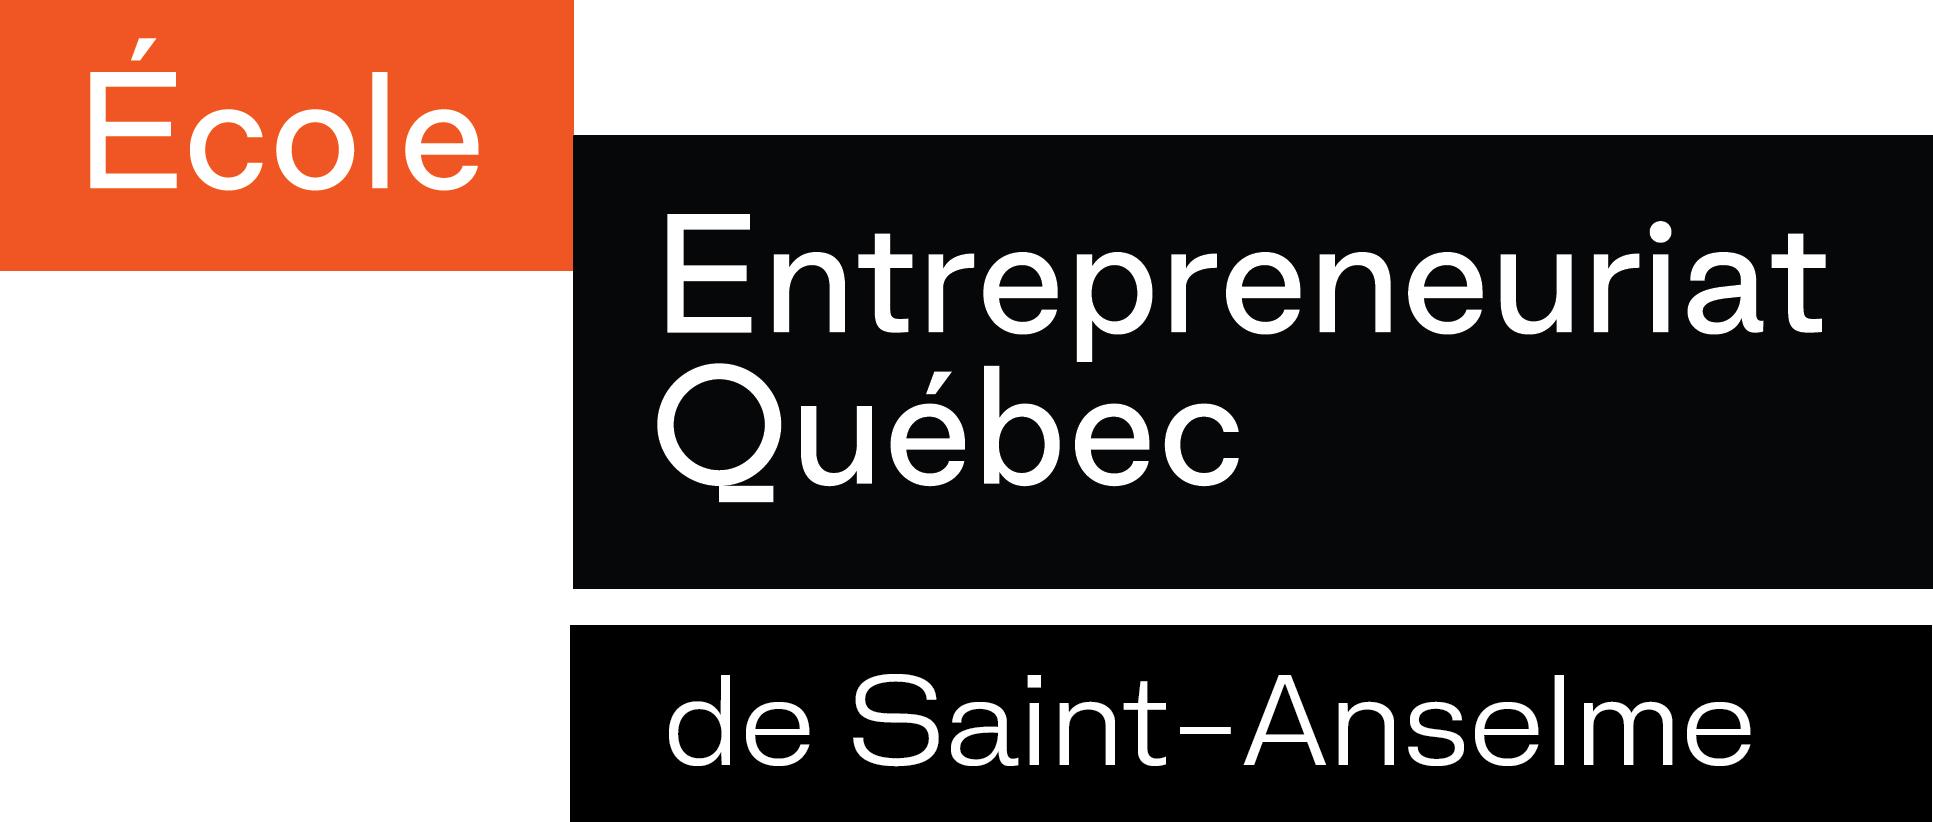 Logos ÉEQ de Saint-Anselme.jpg